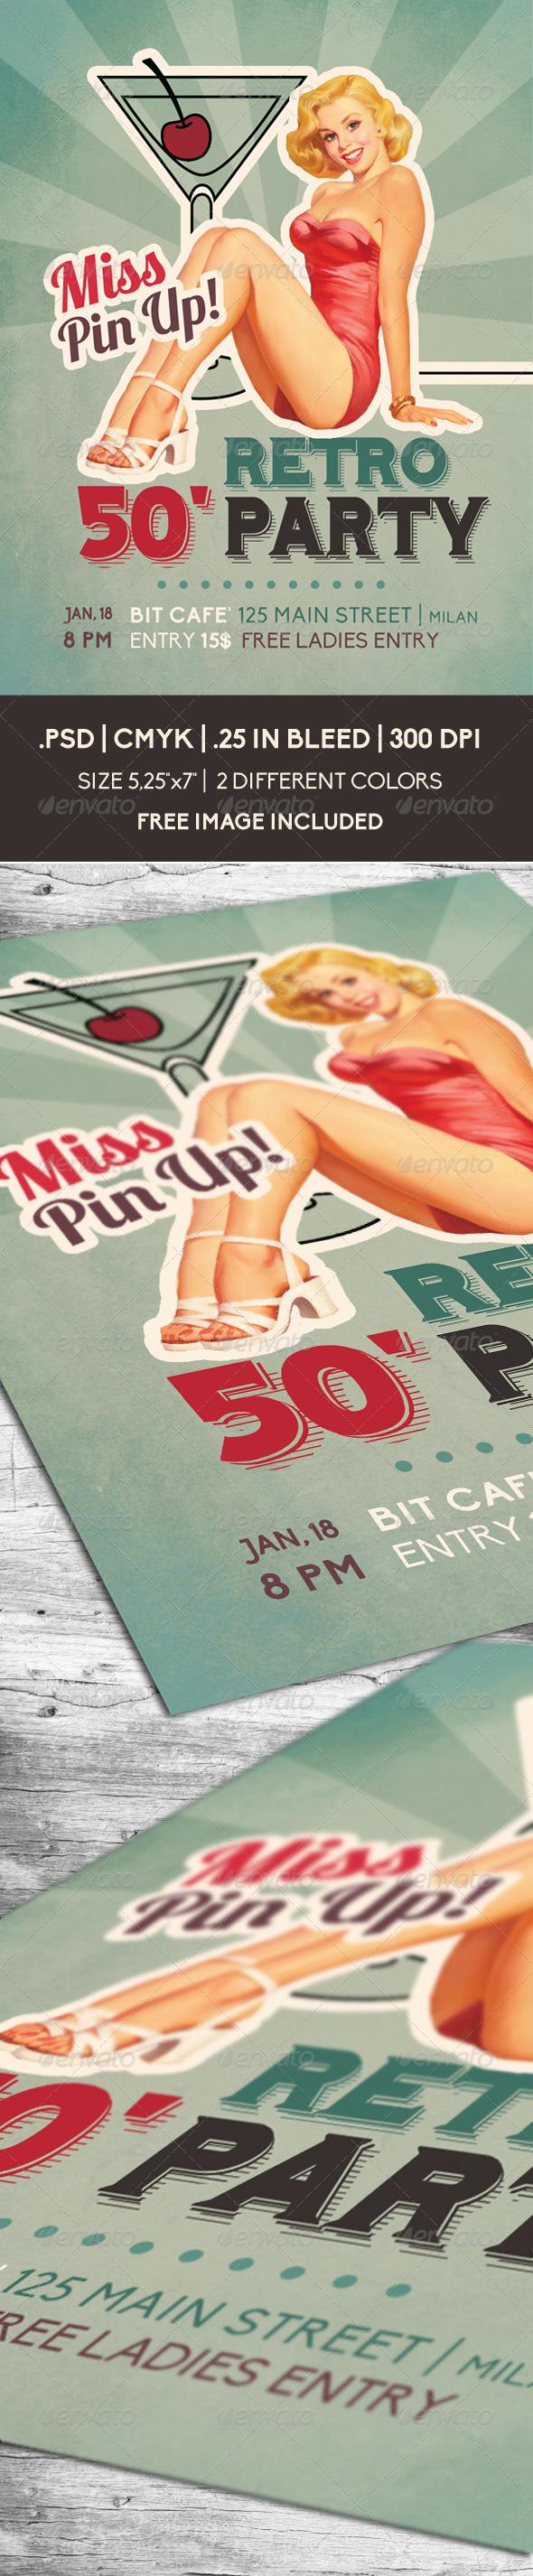 GraphicRiver Retro 50 Party Flyer 6490641